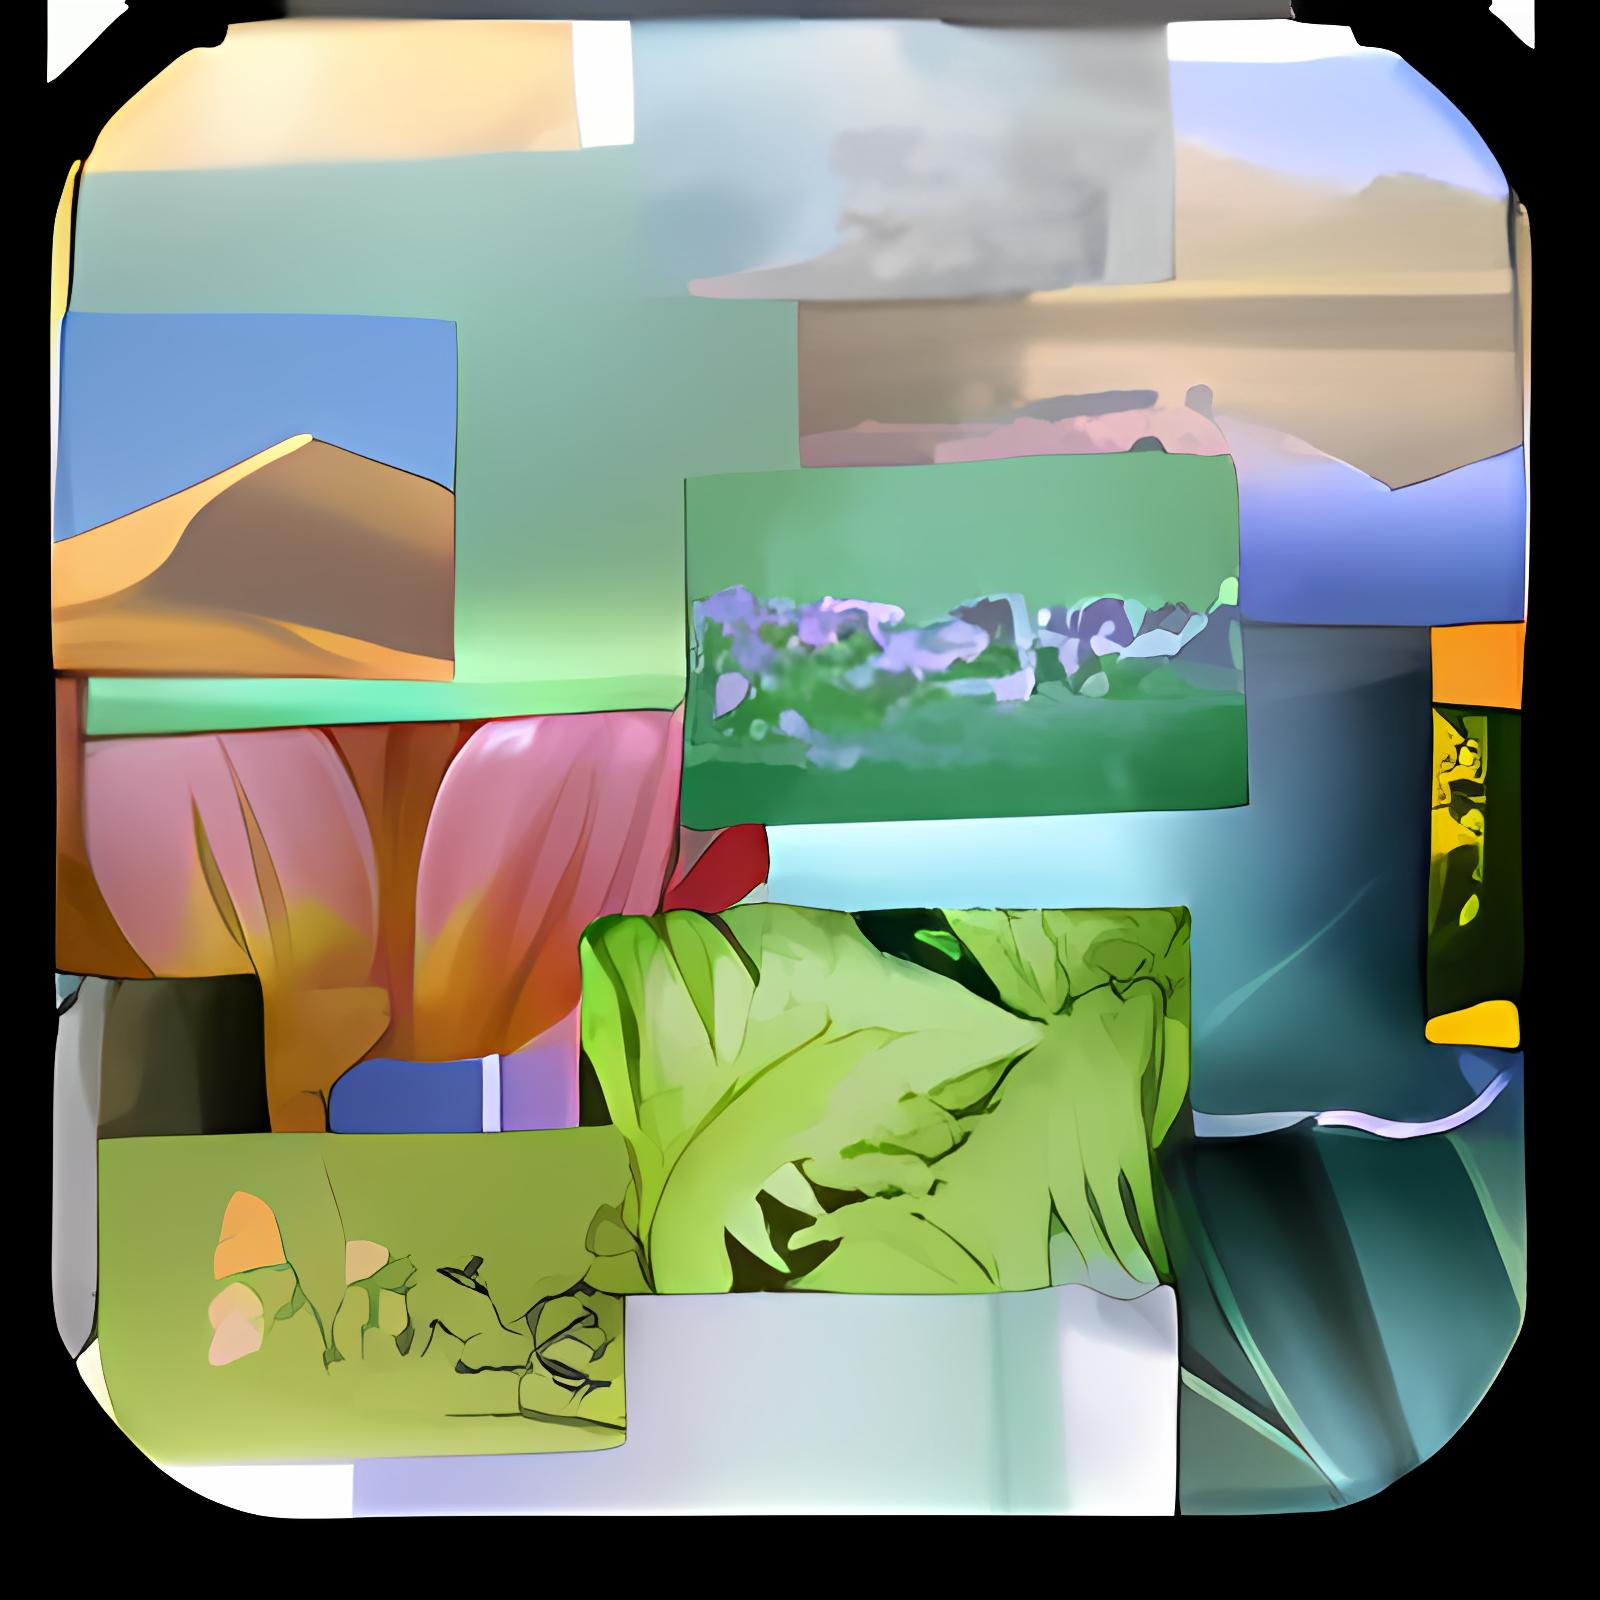 Official Windows 7 Wallpaper Pack